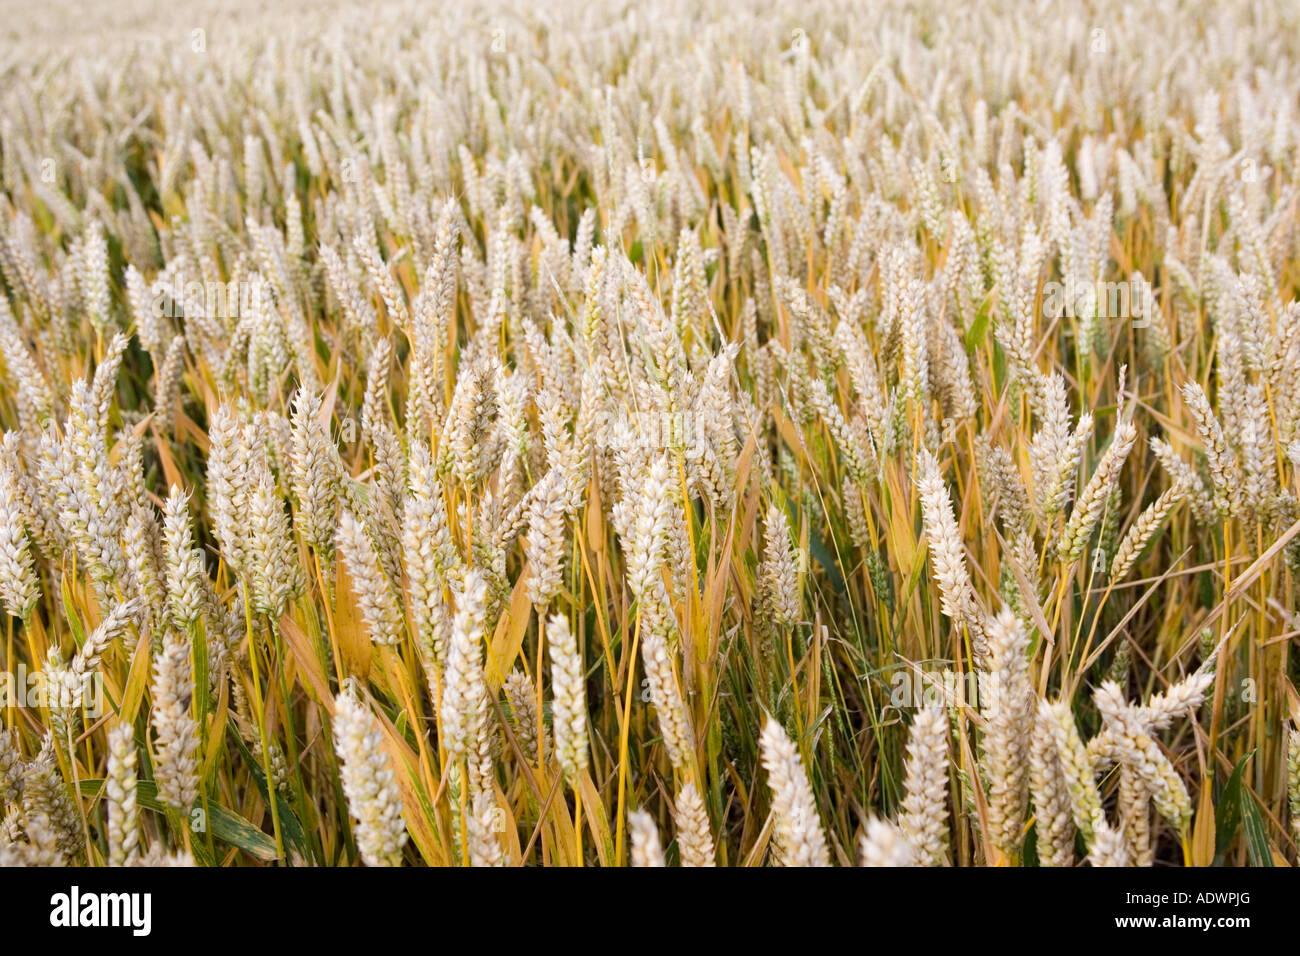 Wheat field in Marlborough Downs Wiltshire England United Kingdom - Stock Image